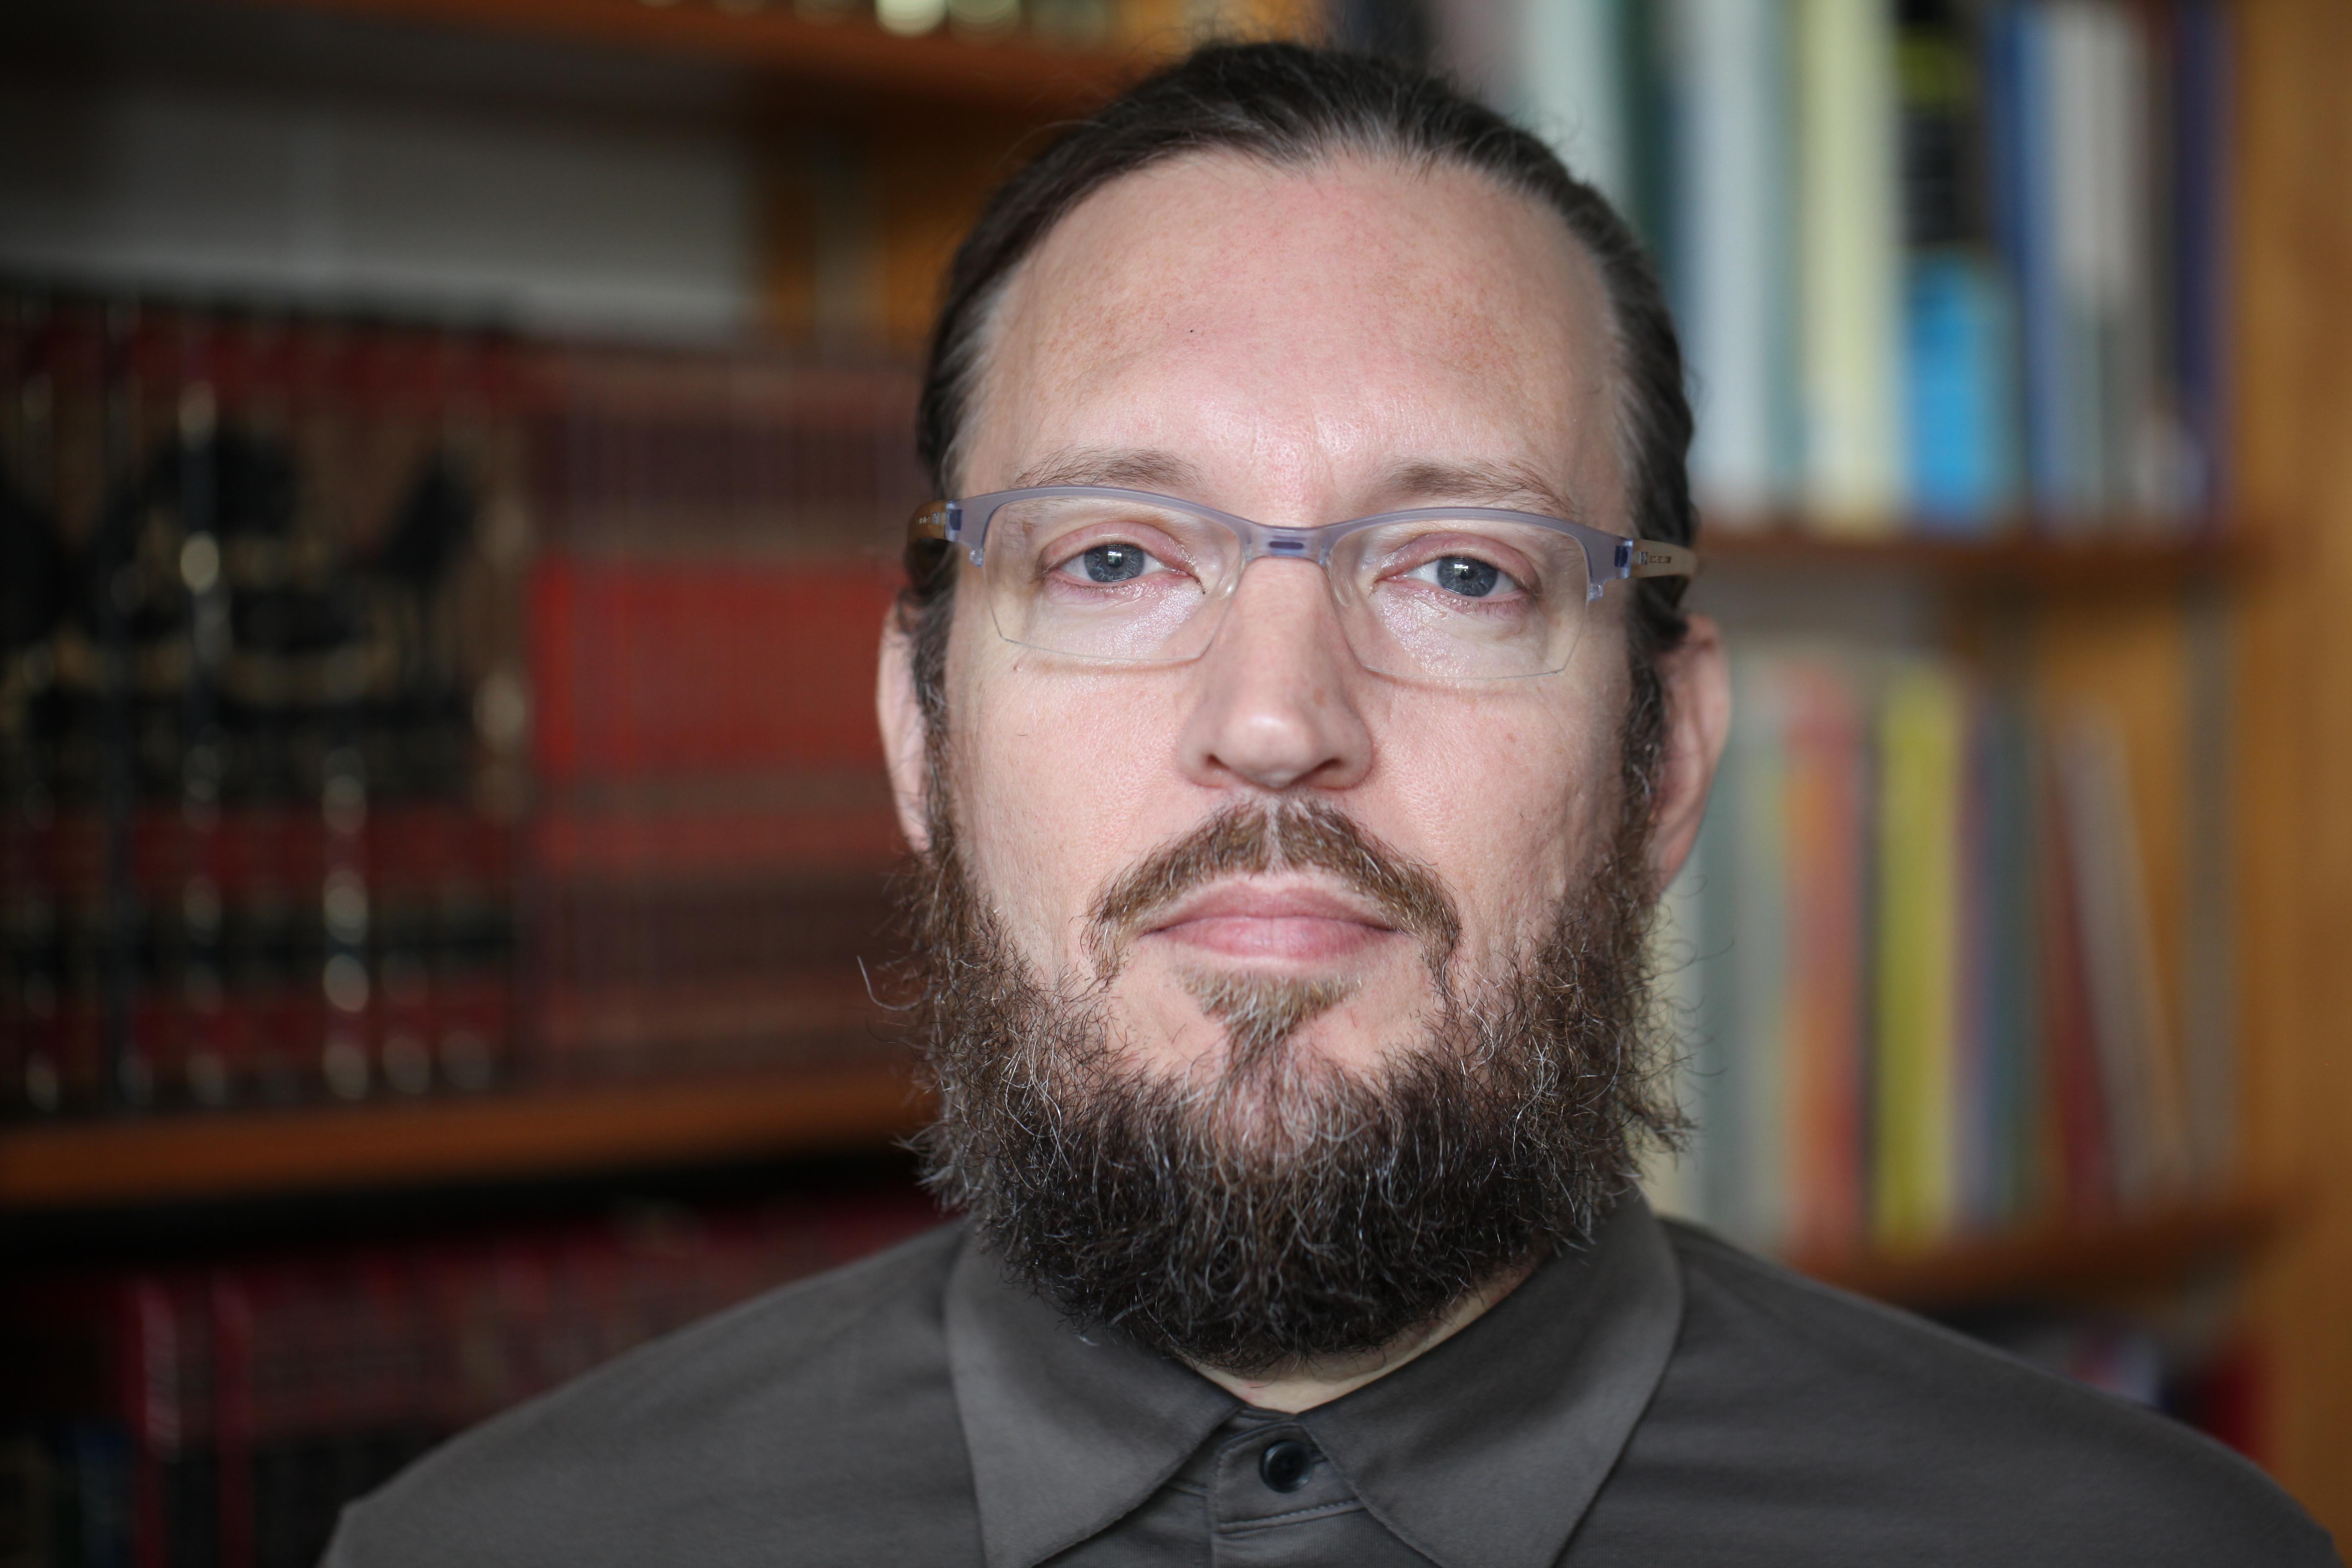 Shaykh Jihad Hashim Brown